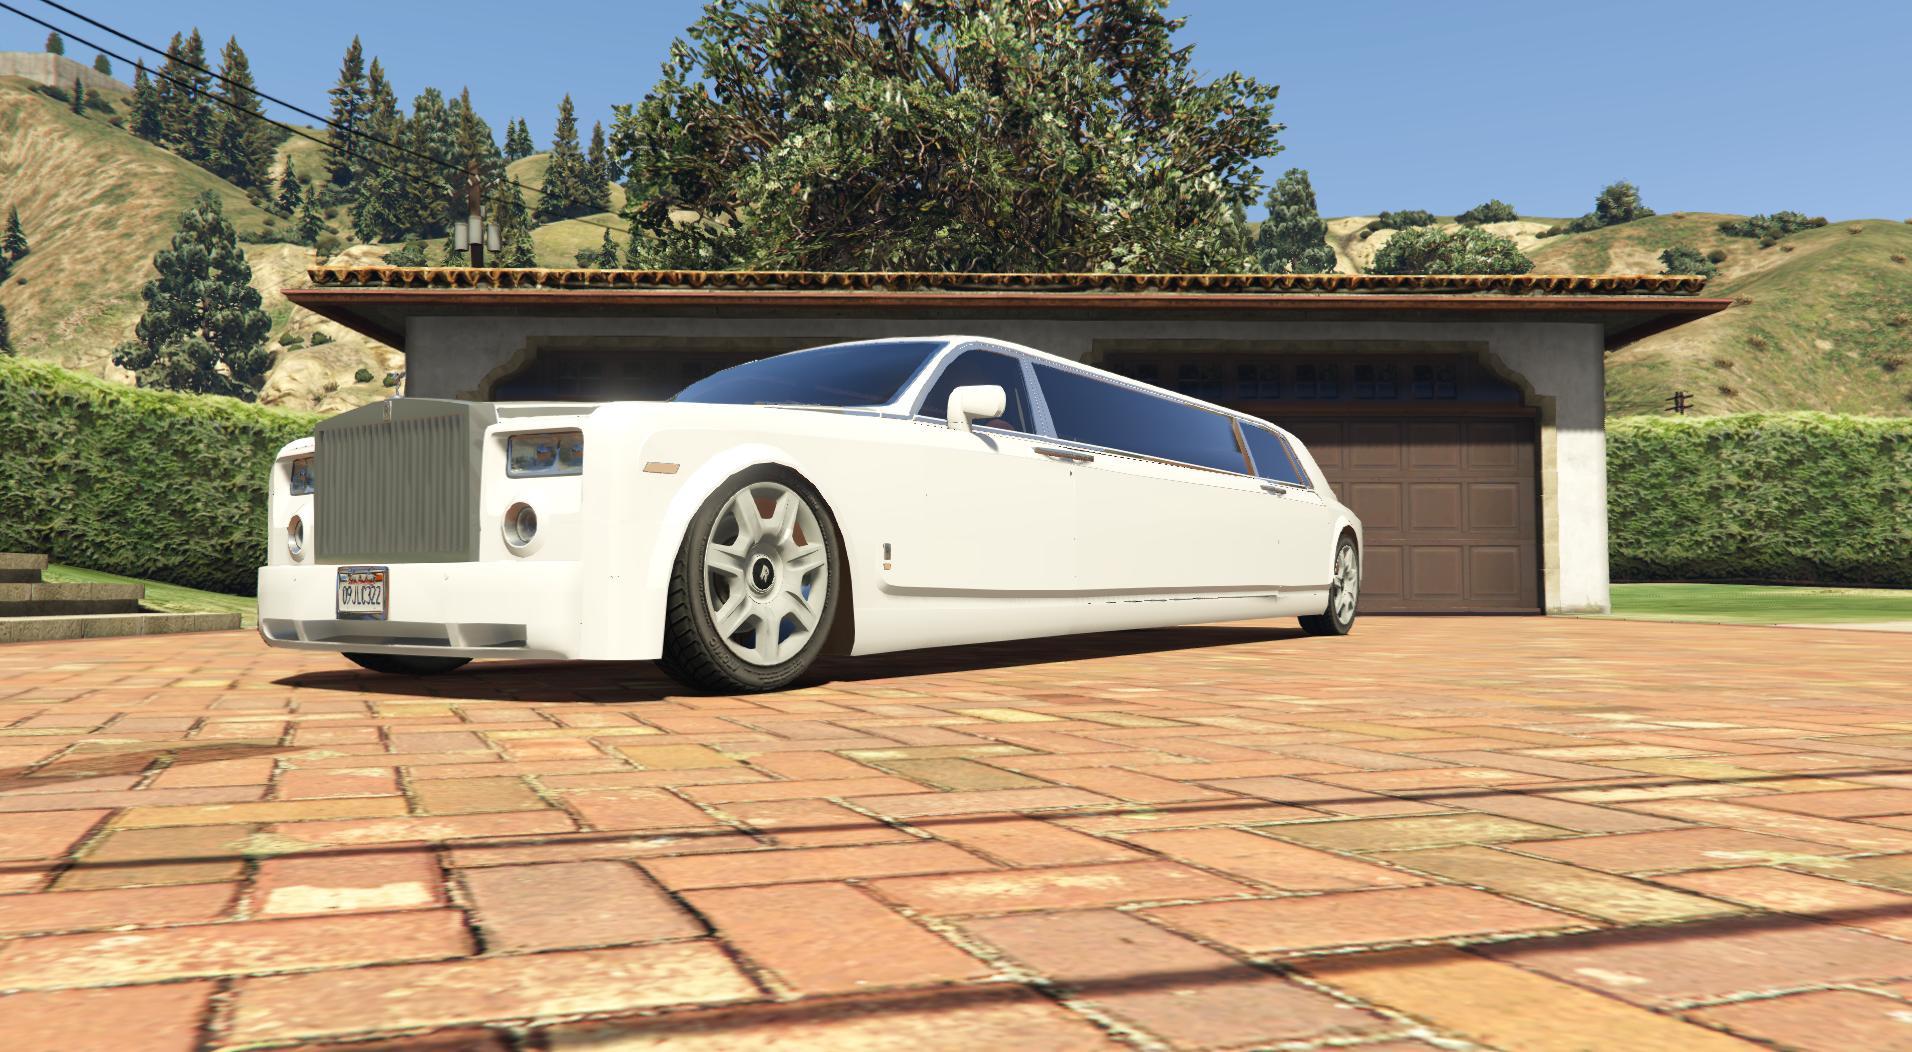 Rolls Royce Limo >> Rolls Royce Phantom Limo Gta5 Mods Com